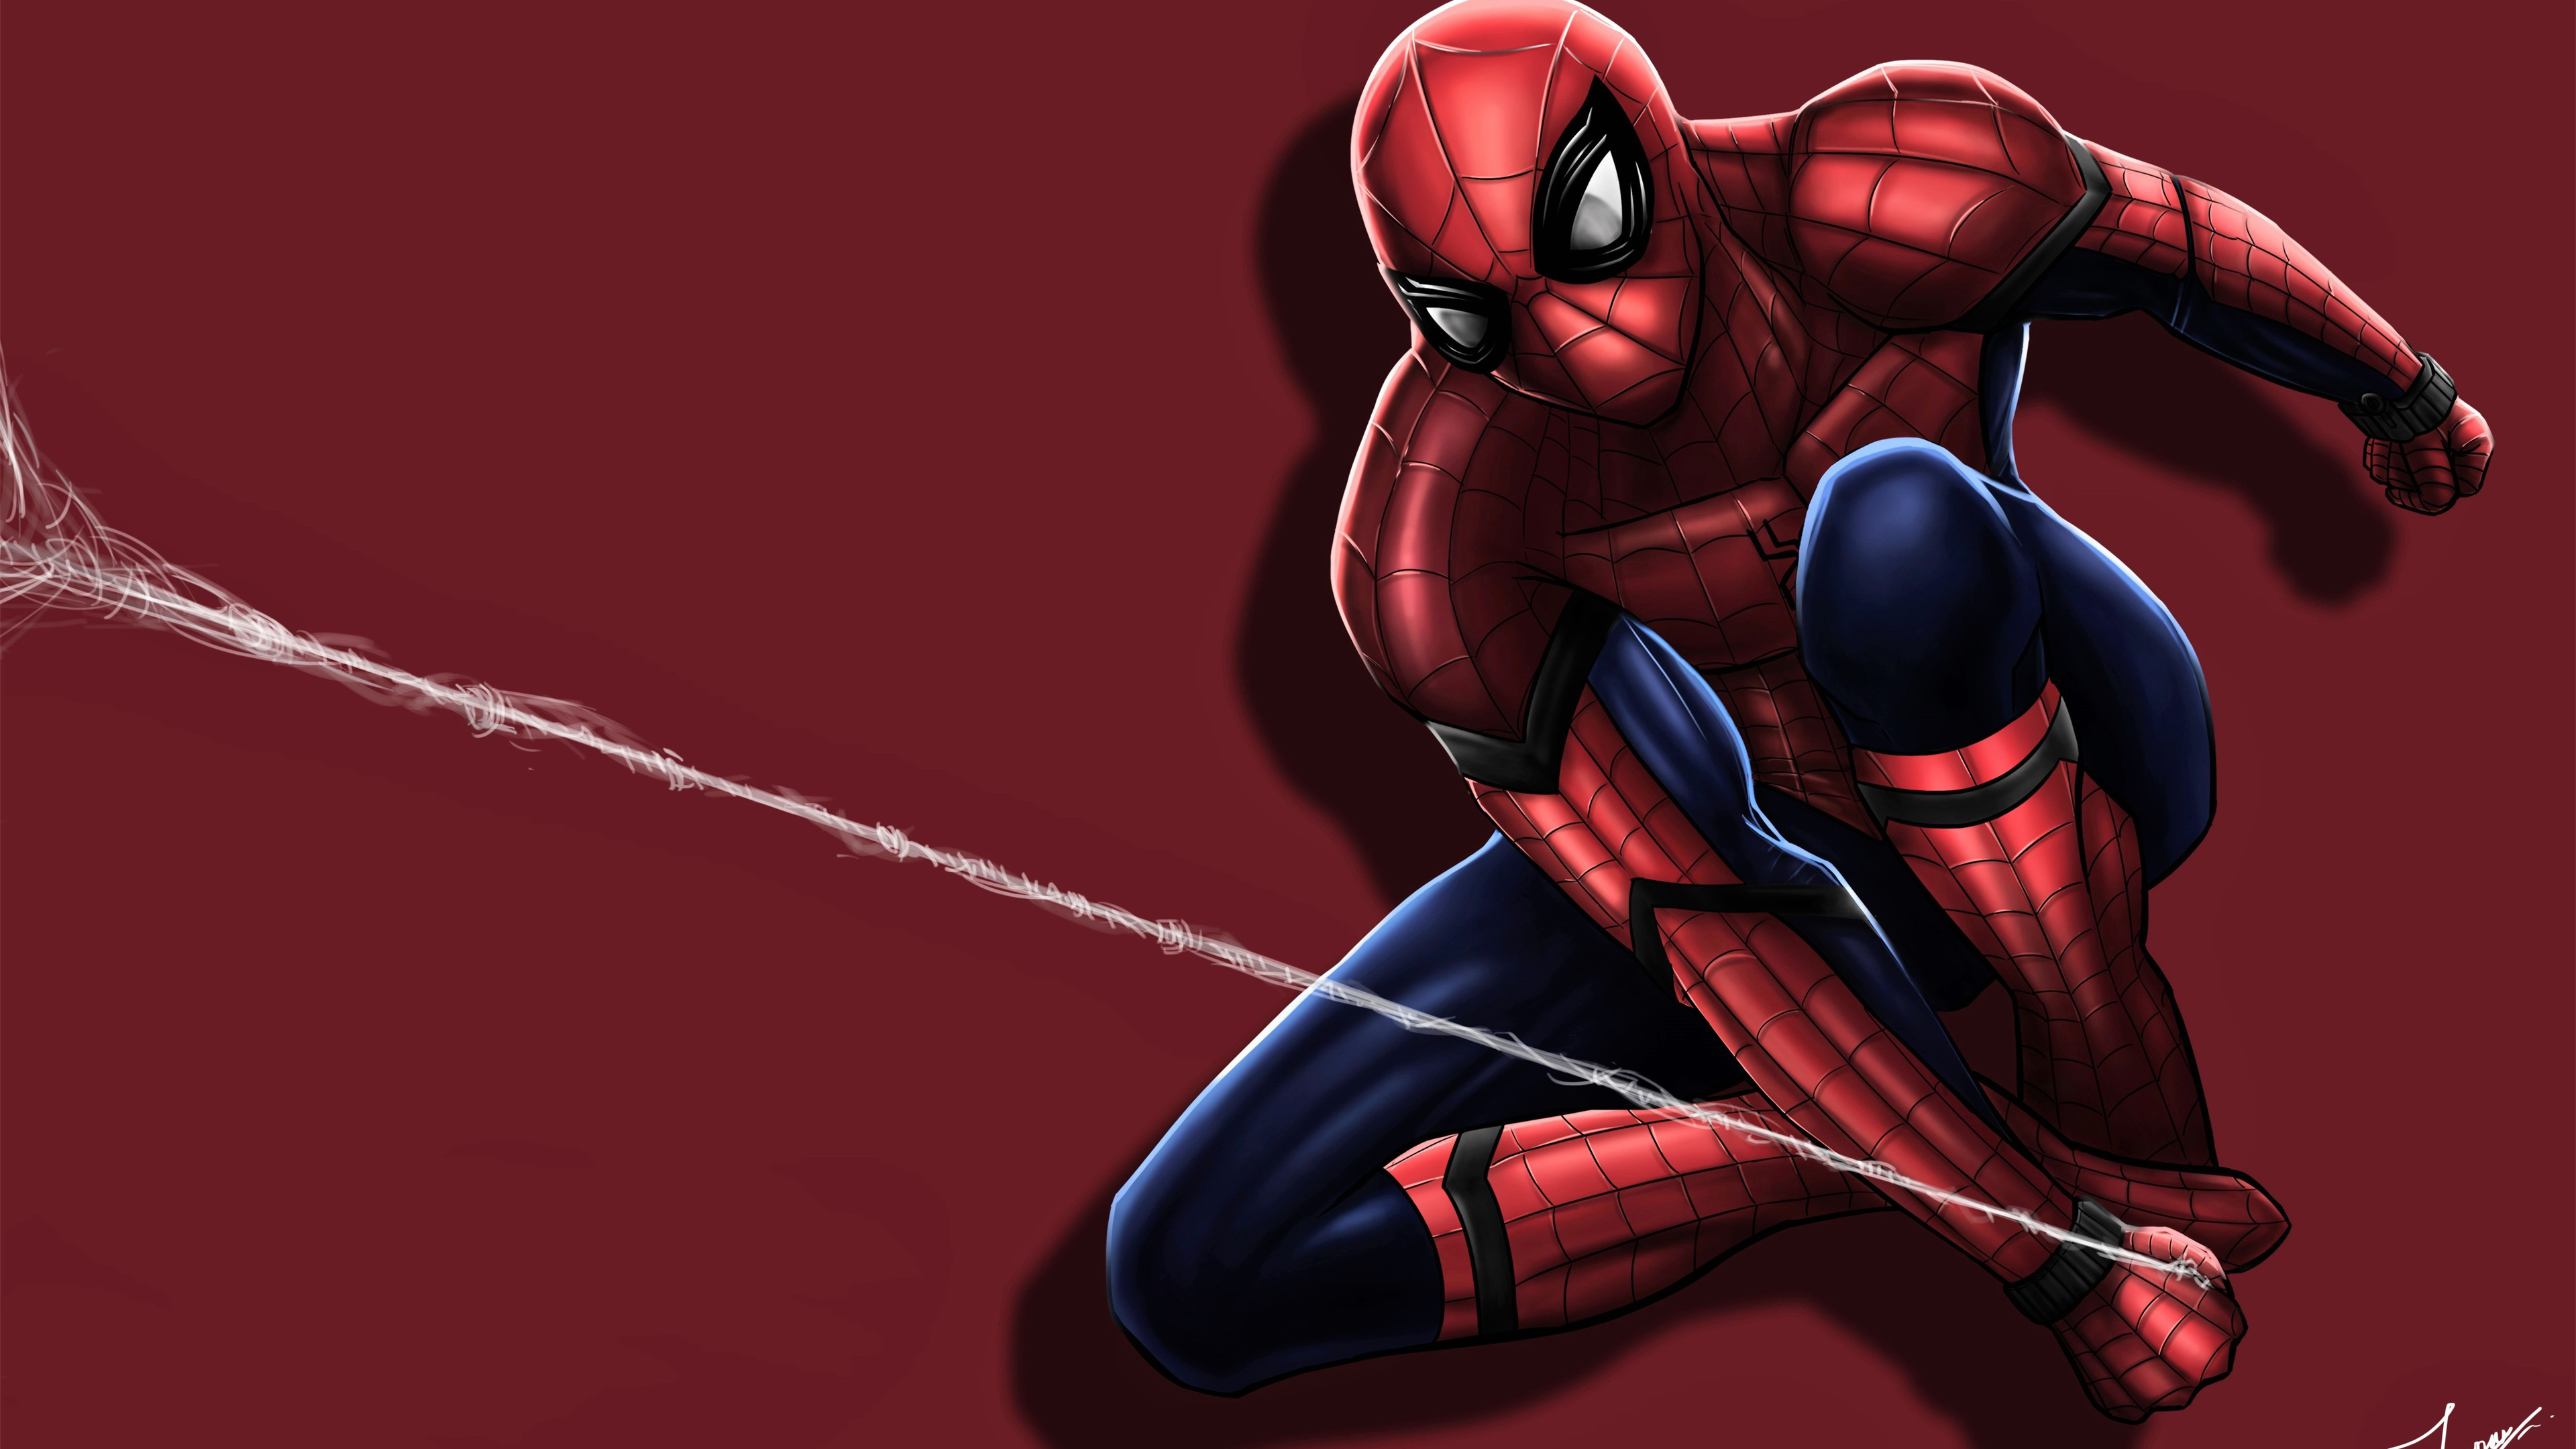 spiderman shooting his web 1536522652 - Spiderman Shooting His Web - superheroes wallpapers, spiderman wallpapers, hd-wallpapers, digital art wallpapers, deviantart wallpapers, artwork wallpapers, artist wallpapers, 5k wallpapers, 4k-wallpapers